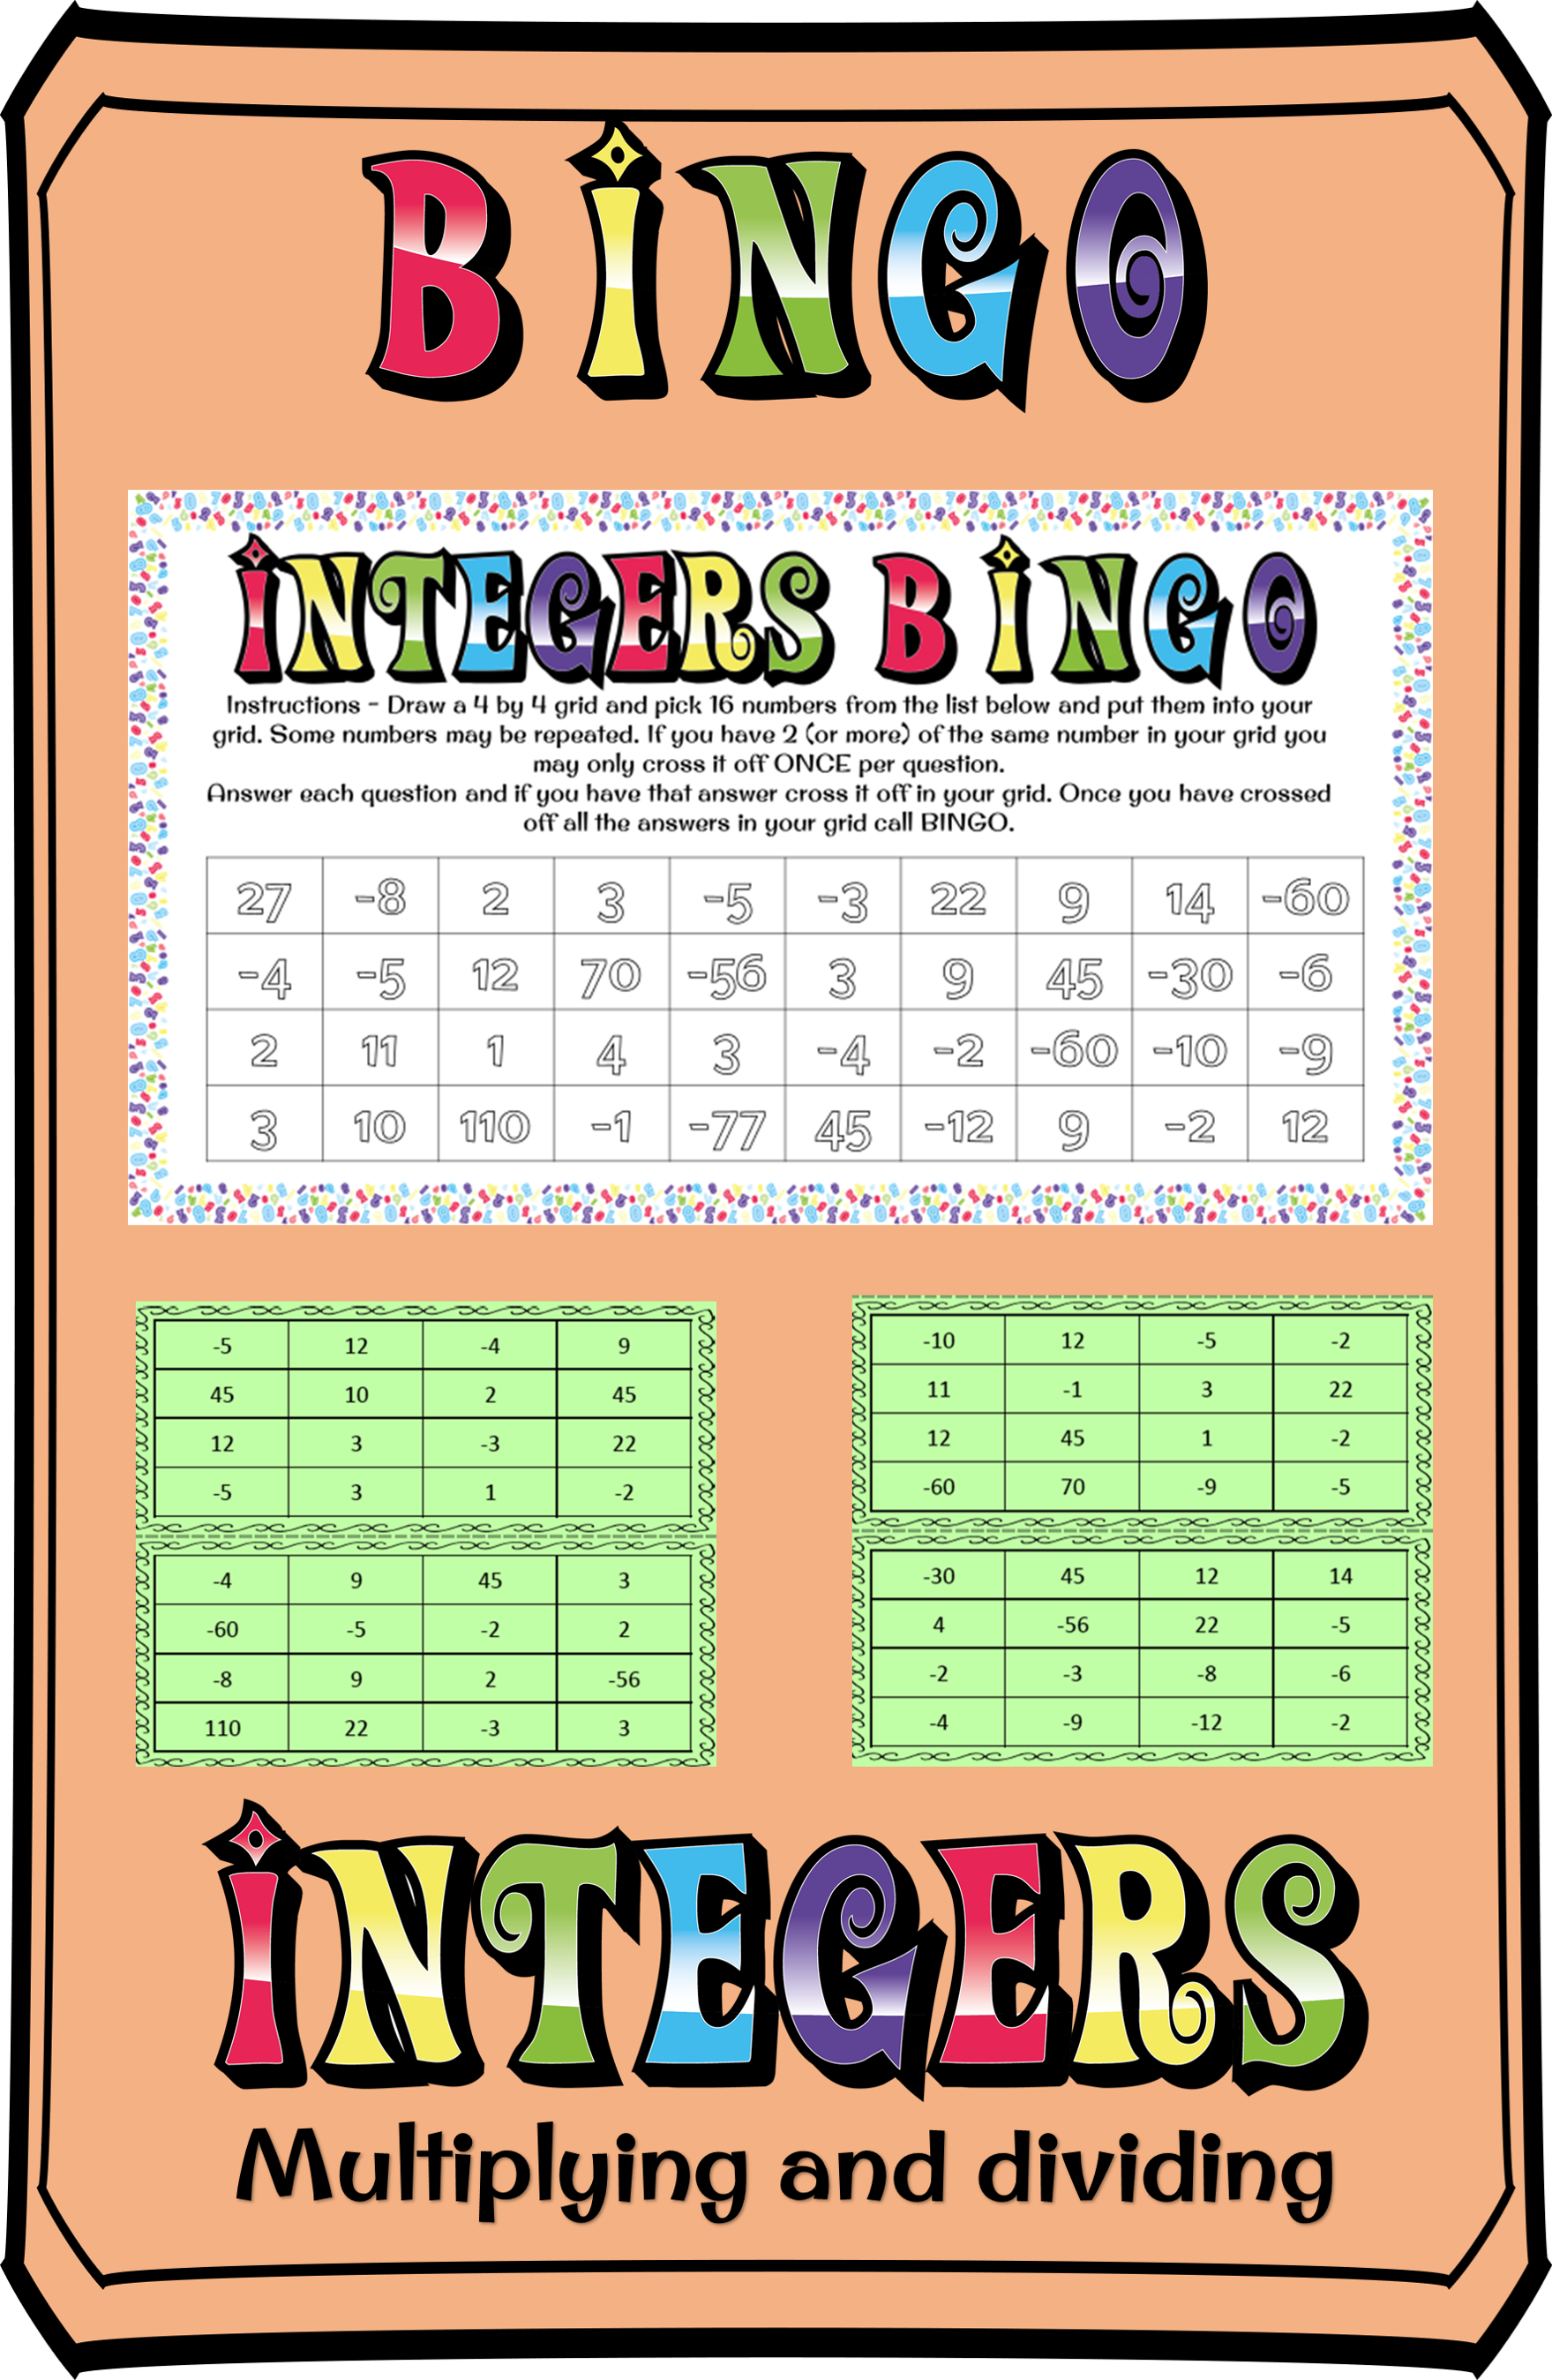 Multiplying And Dividing Integers Bingo